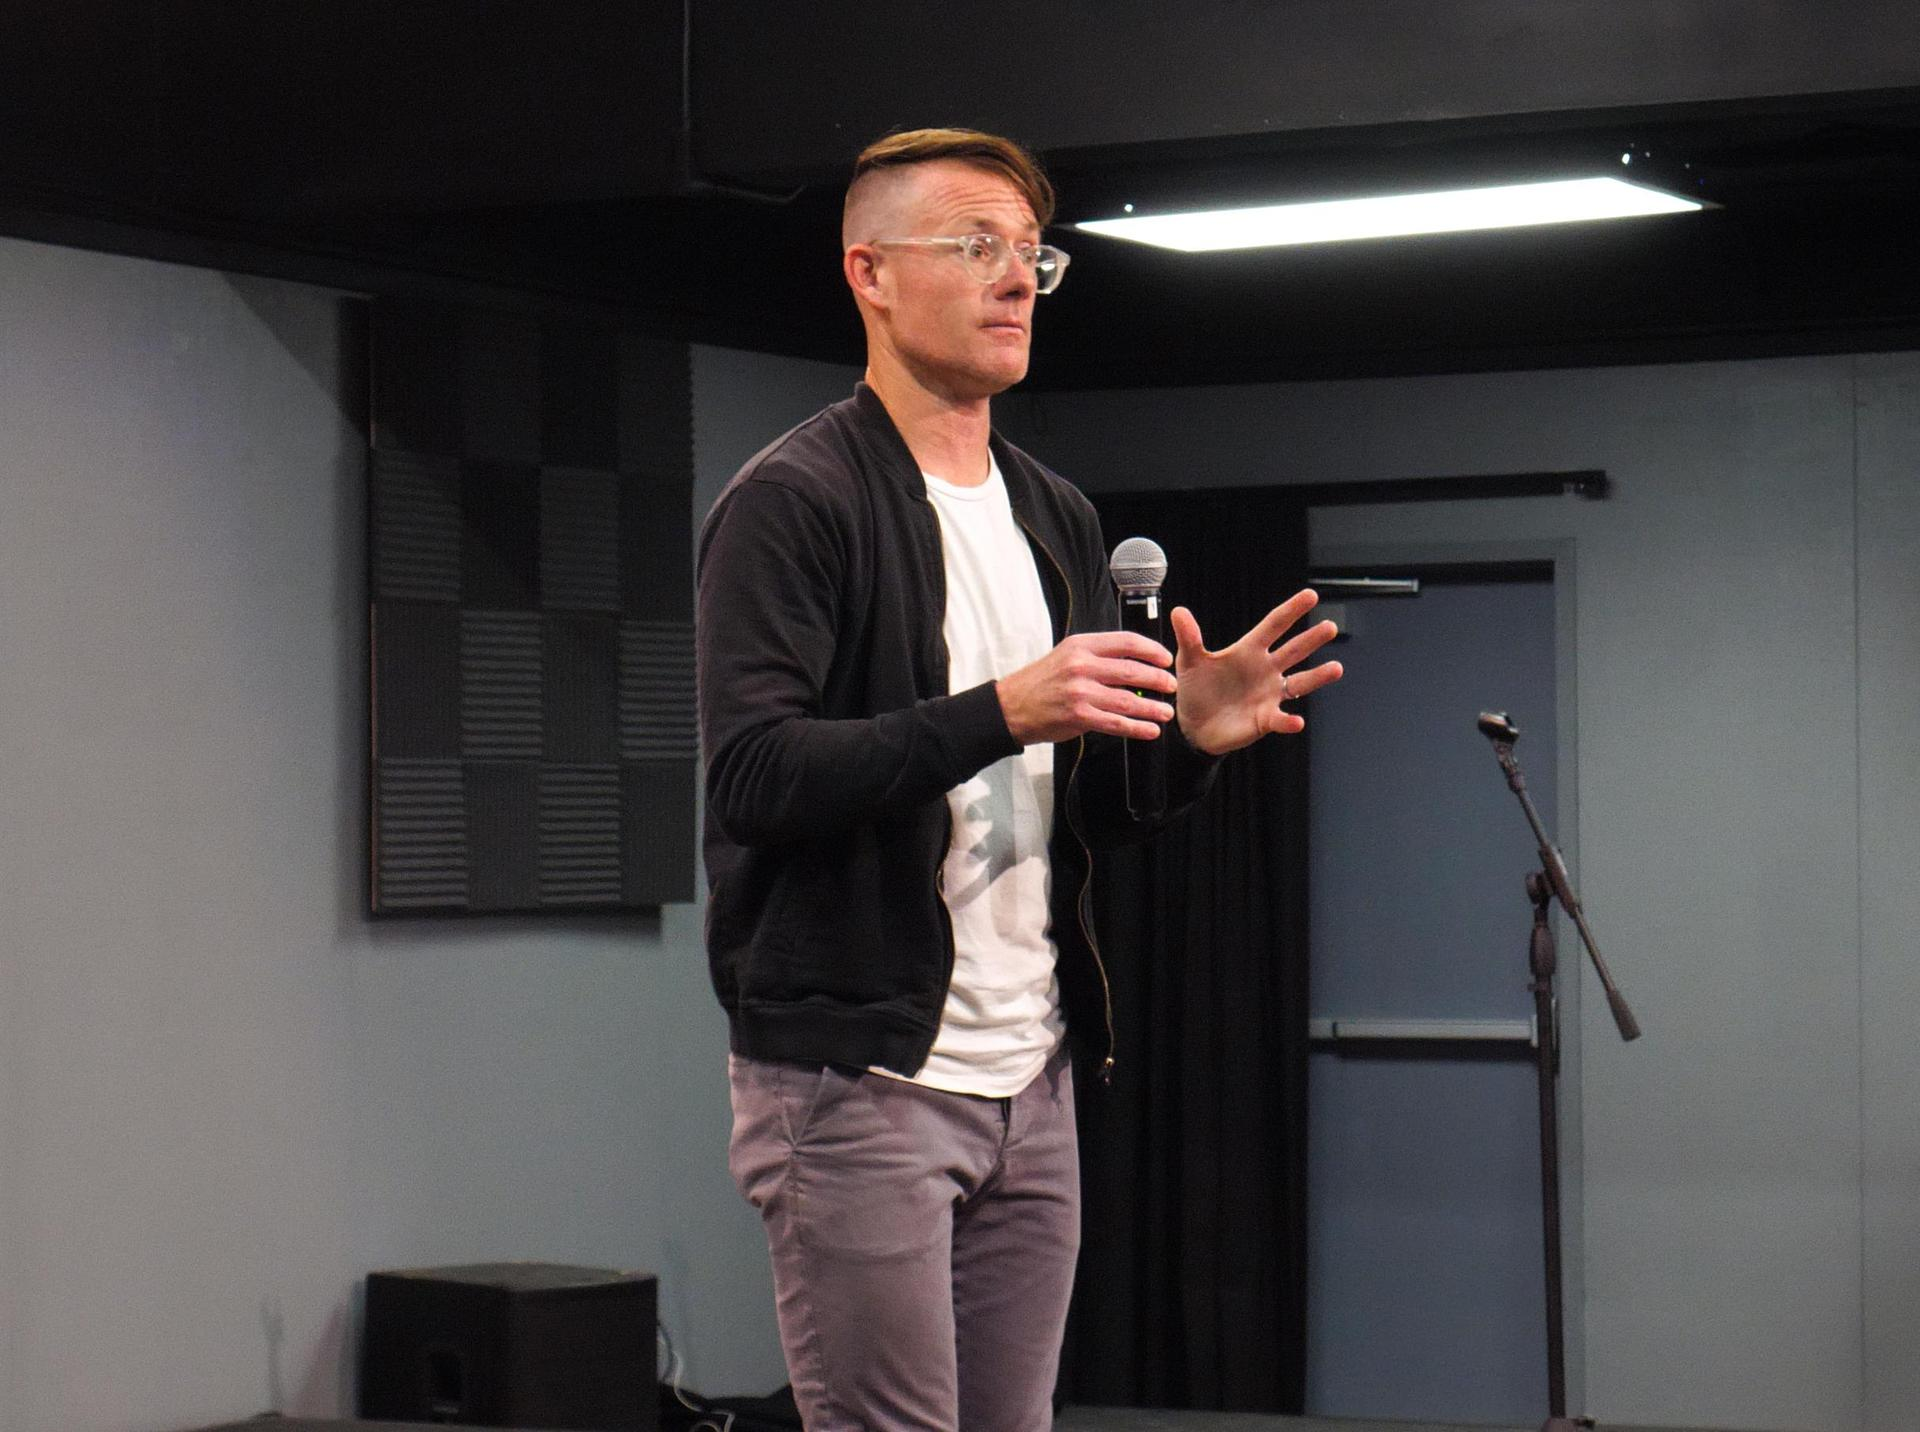 Jonathan Mooney presenting to parents